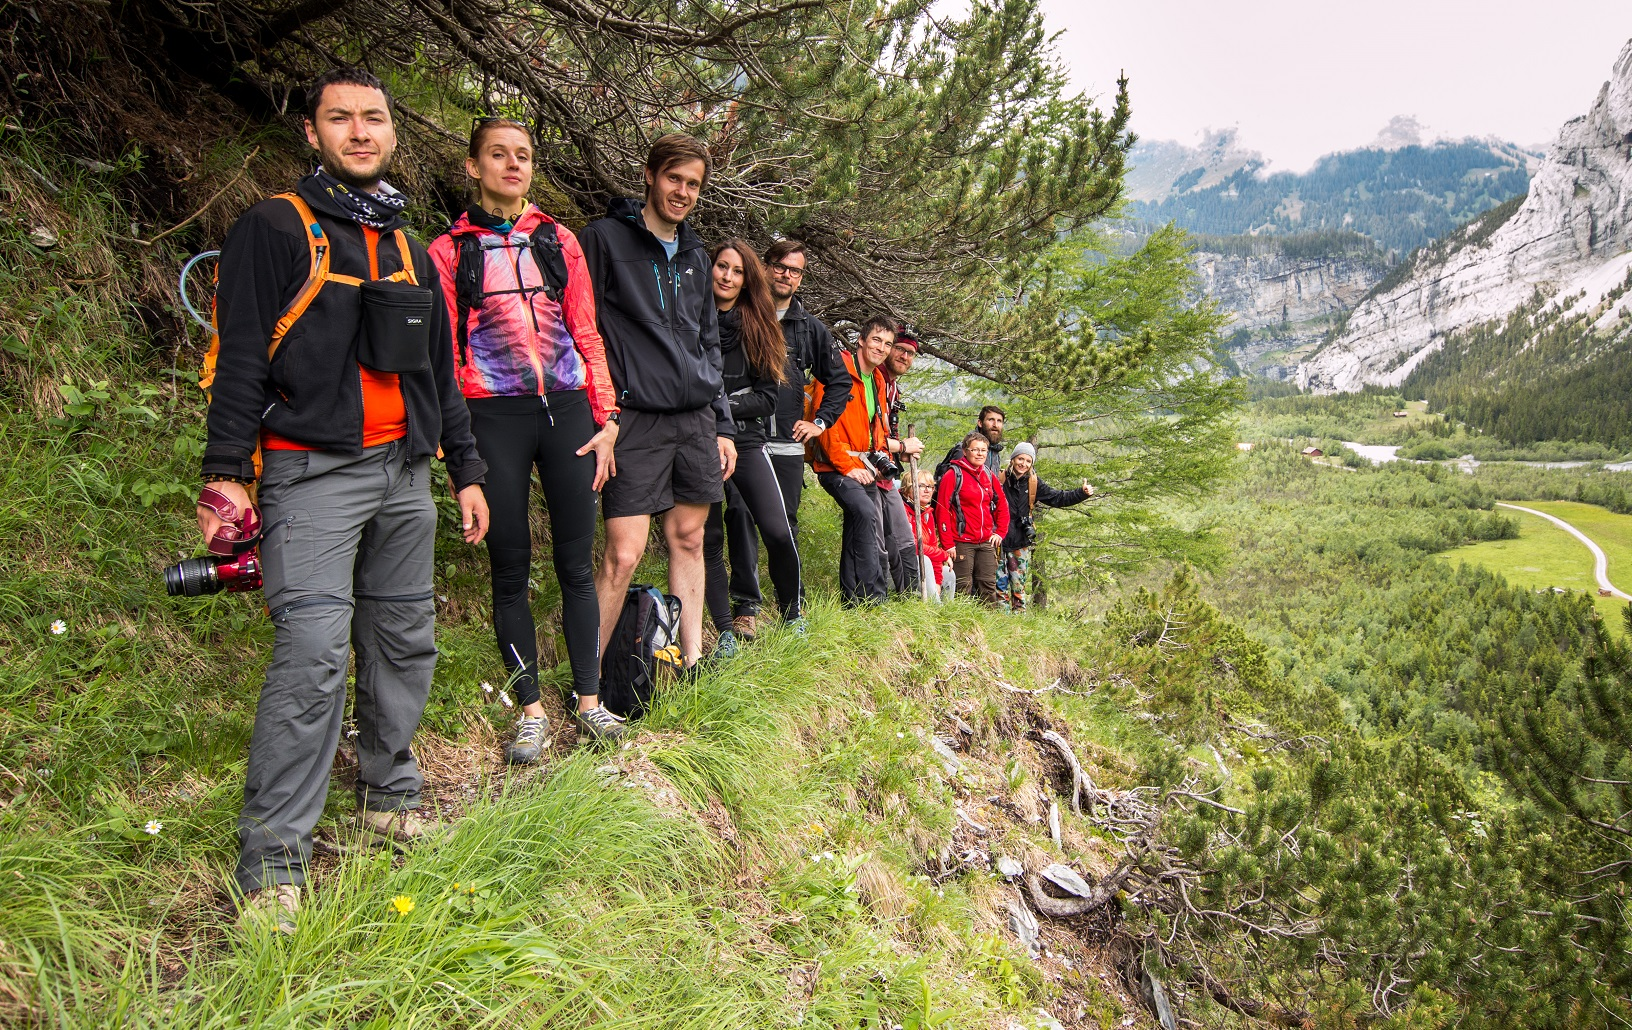 Travel adventure team szwajcaria